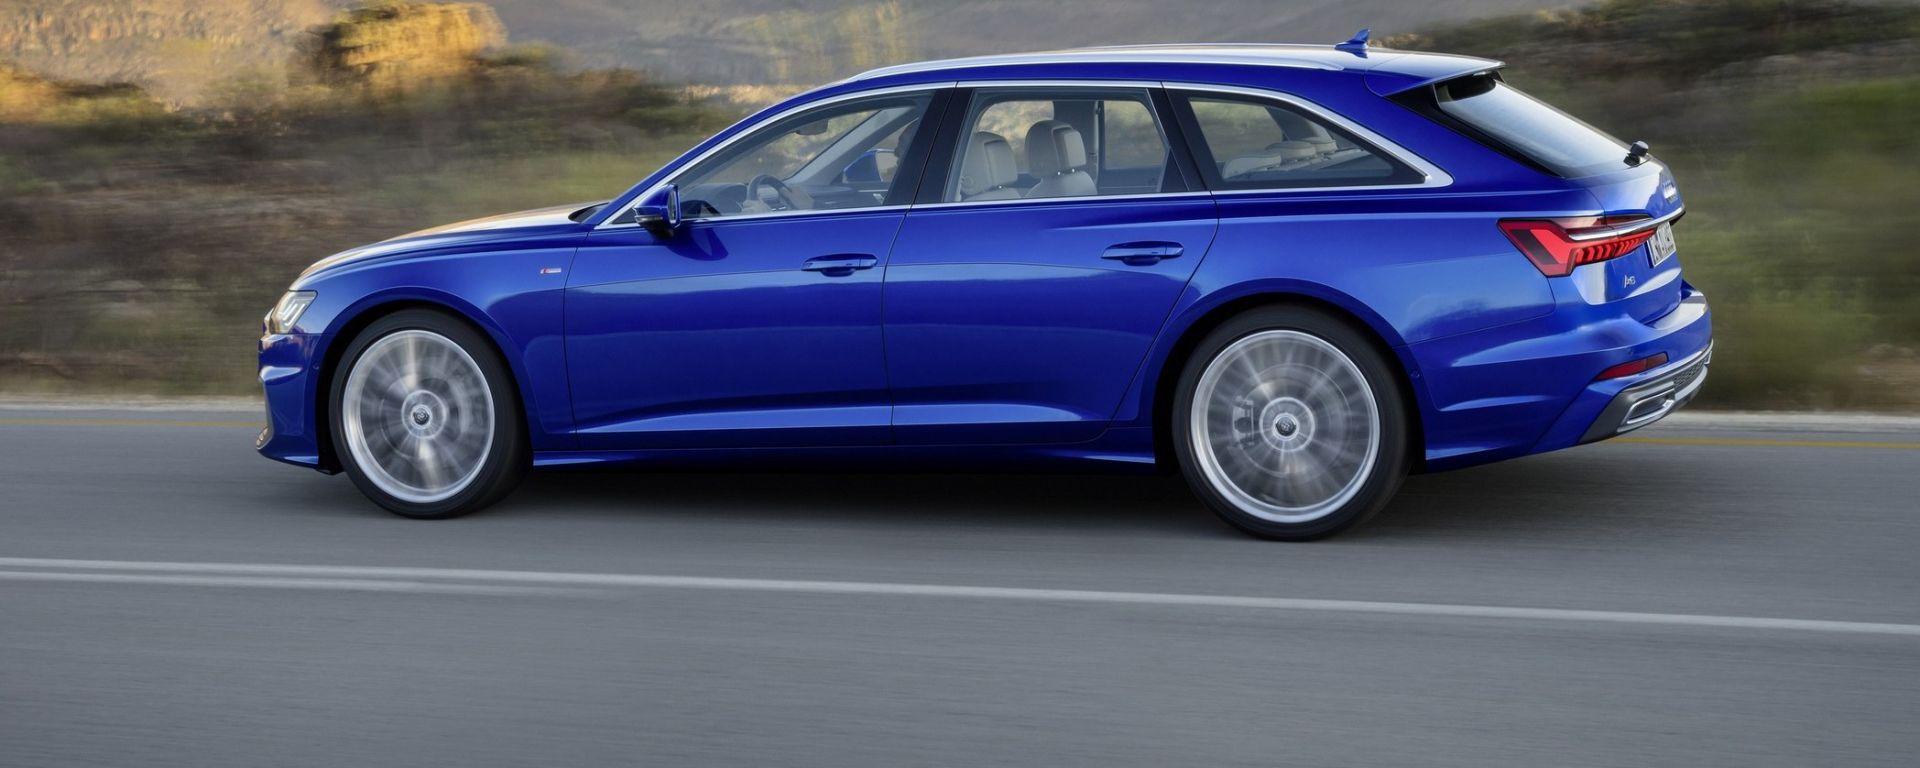 Nuova Audi A6 Avant: station wagon per famiglie hi-tech